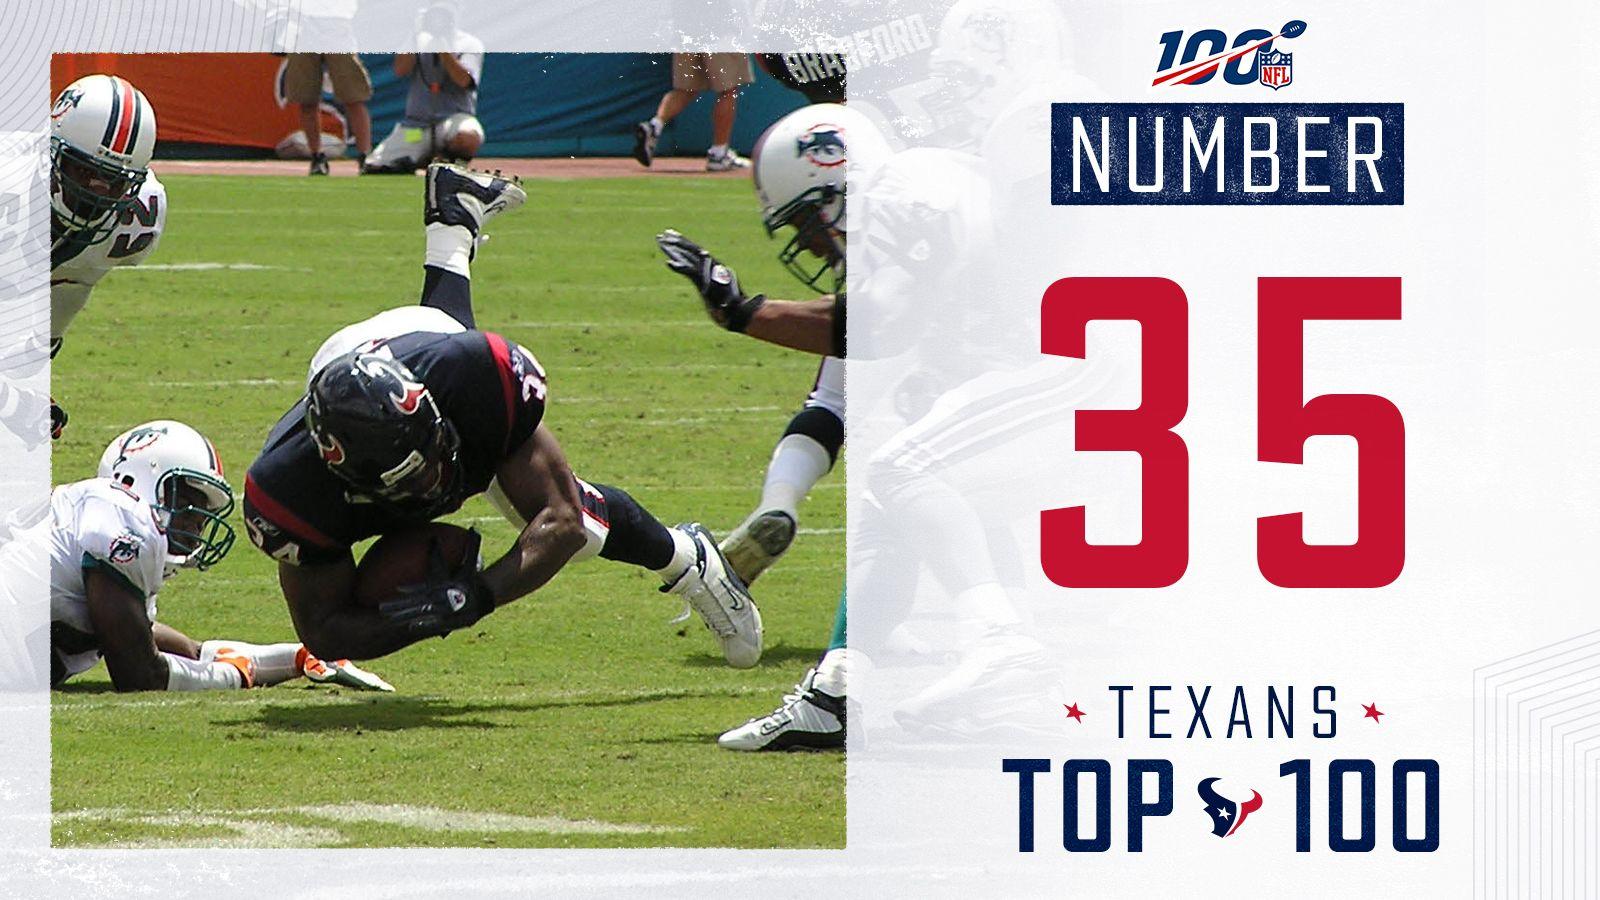 35_Texans beat Dolphins in 2003 opener - TWITTER